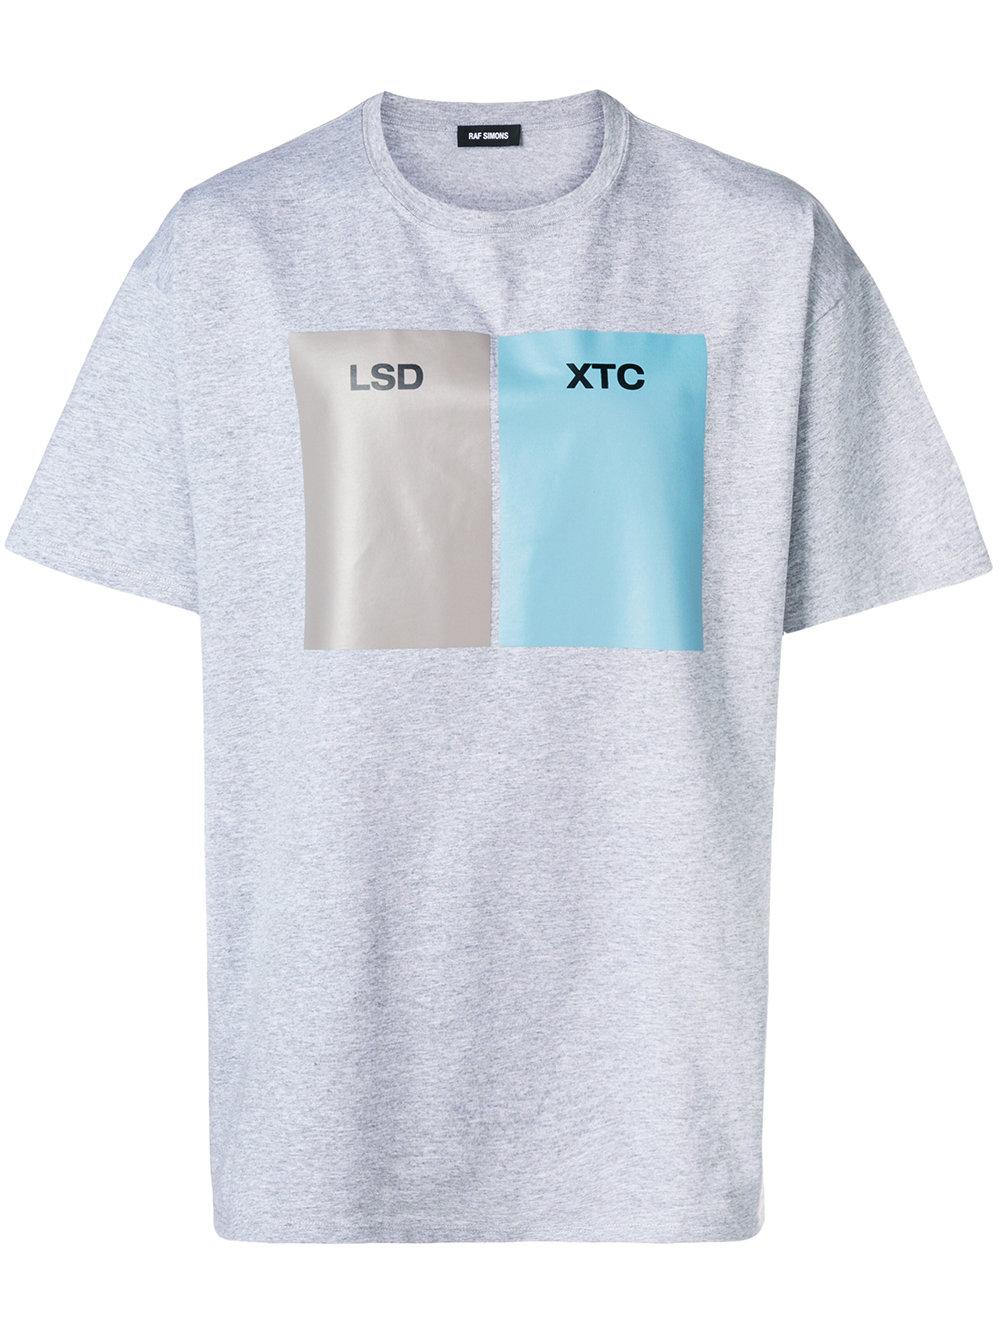 Raf Simons   LSD XTC Grey T-Shirt